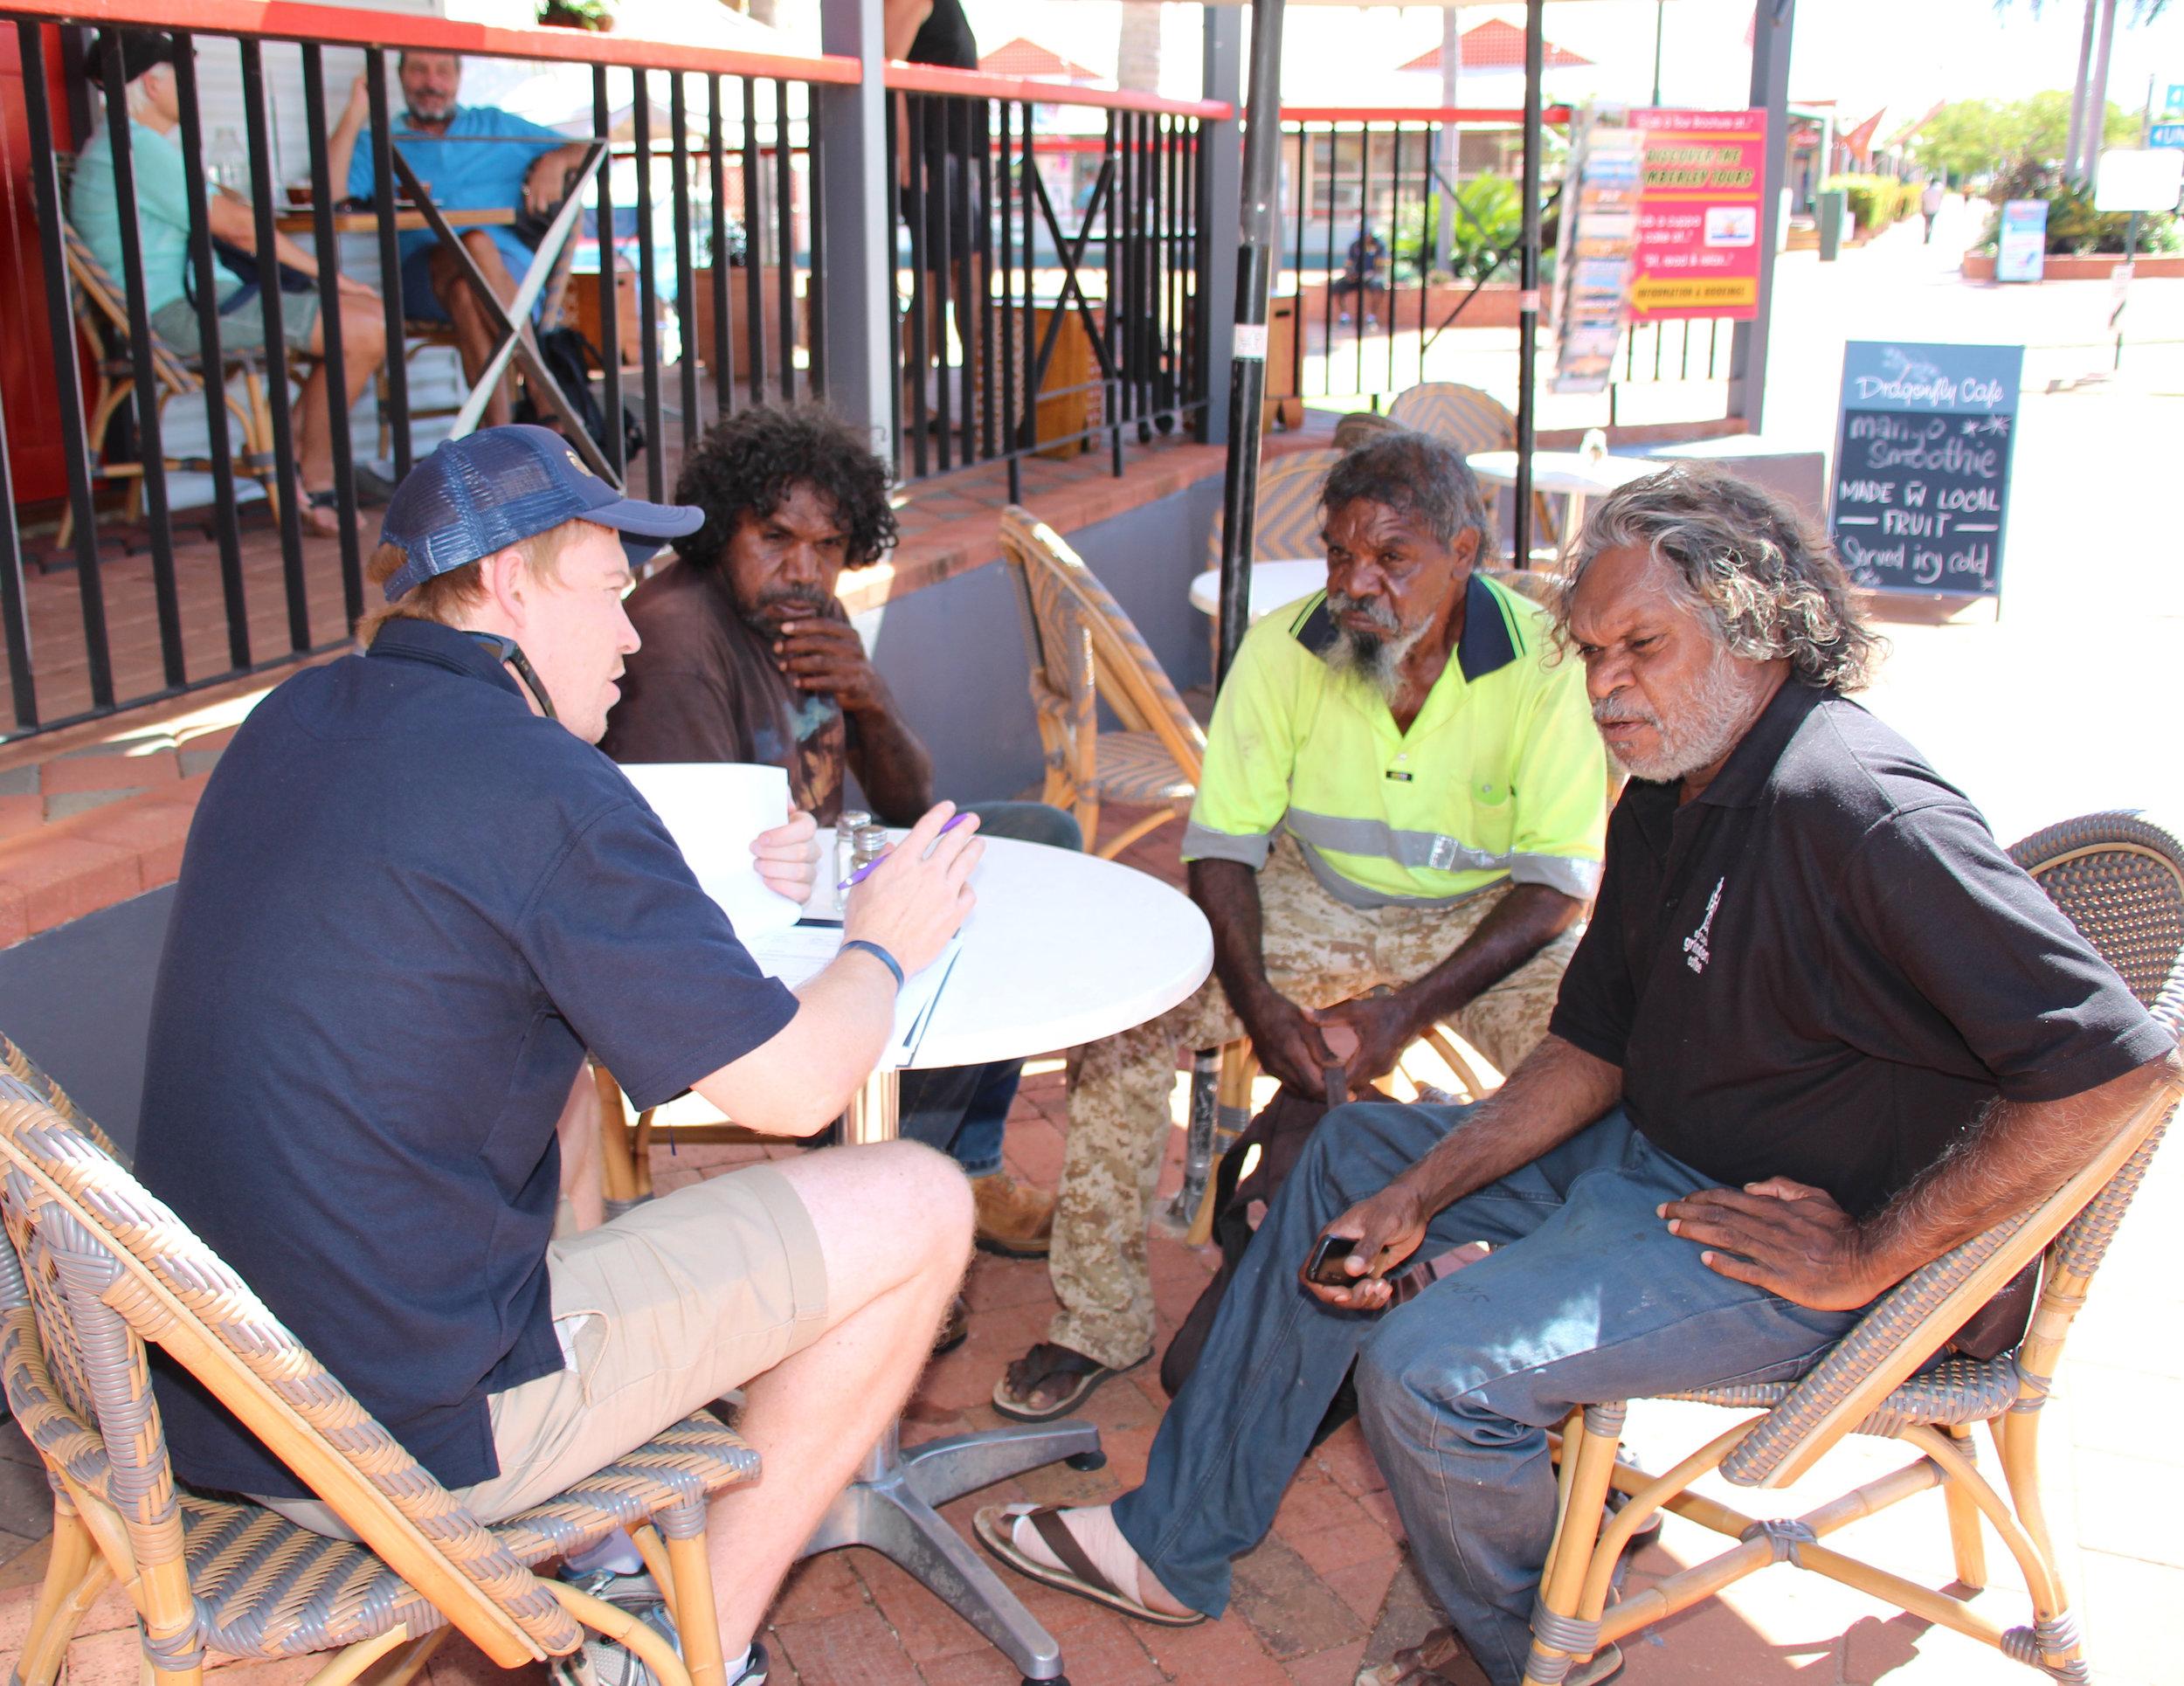 Newcrest Community Relations Advisor, Daniel Tincknell (left), speaks with community members in Broome.